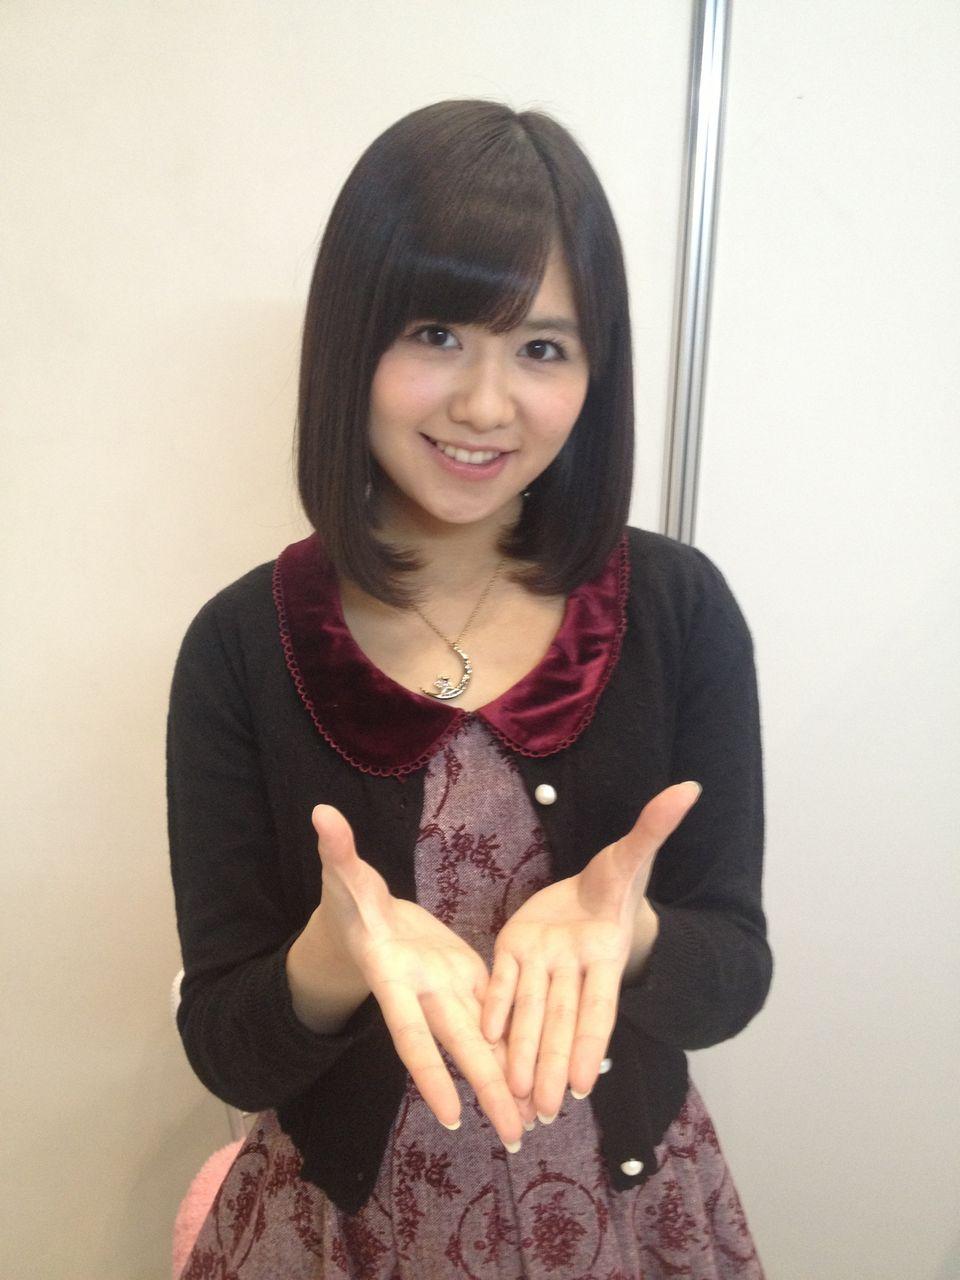 【AKB48】佐藤すみれが可愛い!!